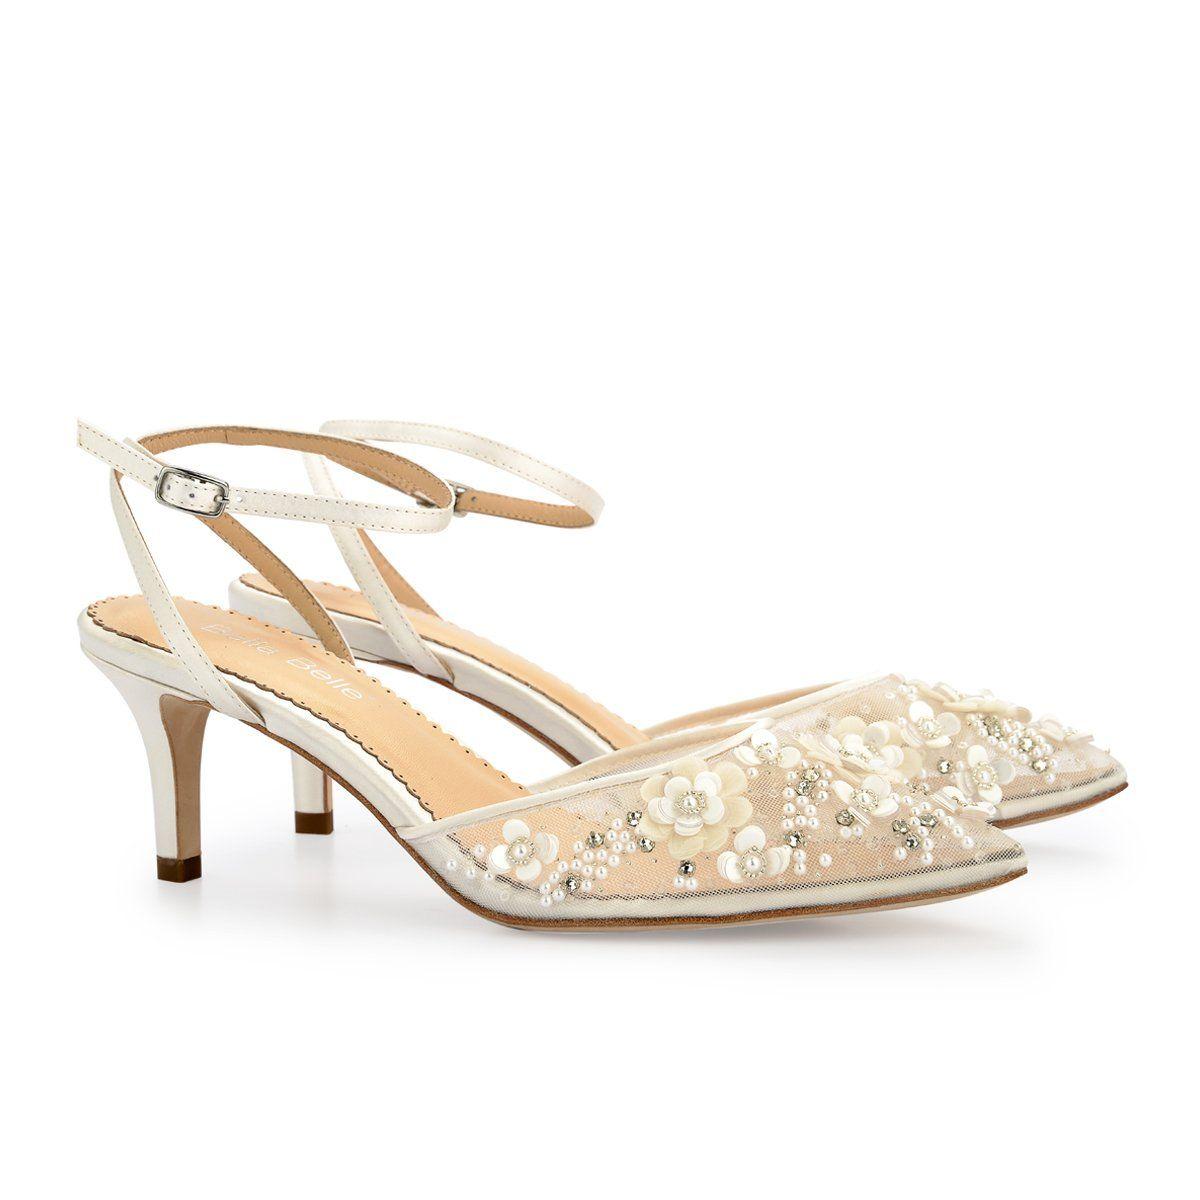 Kitten Heel Ivory Pearl Wedding Shoes Wedding Shoes Heels Pearl Wedding Shoes Kitten Heel Wedding Shoes